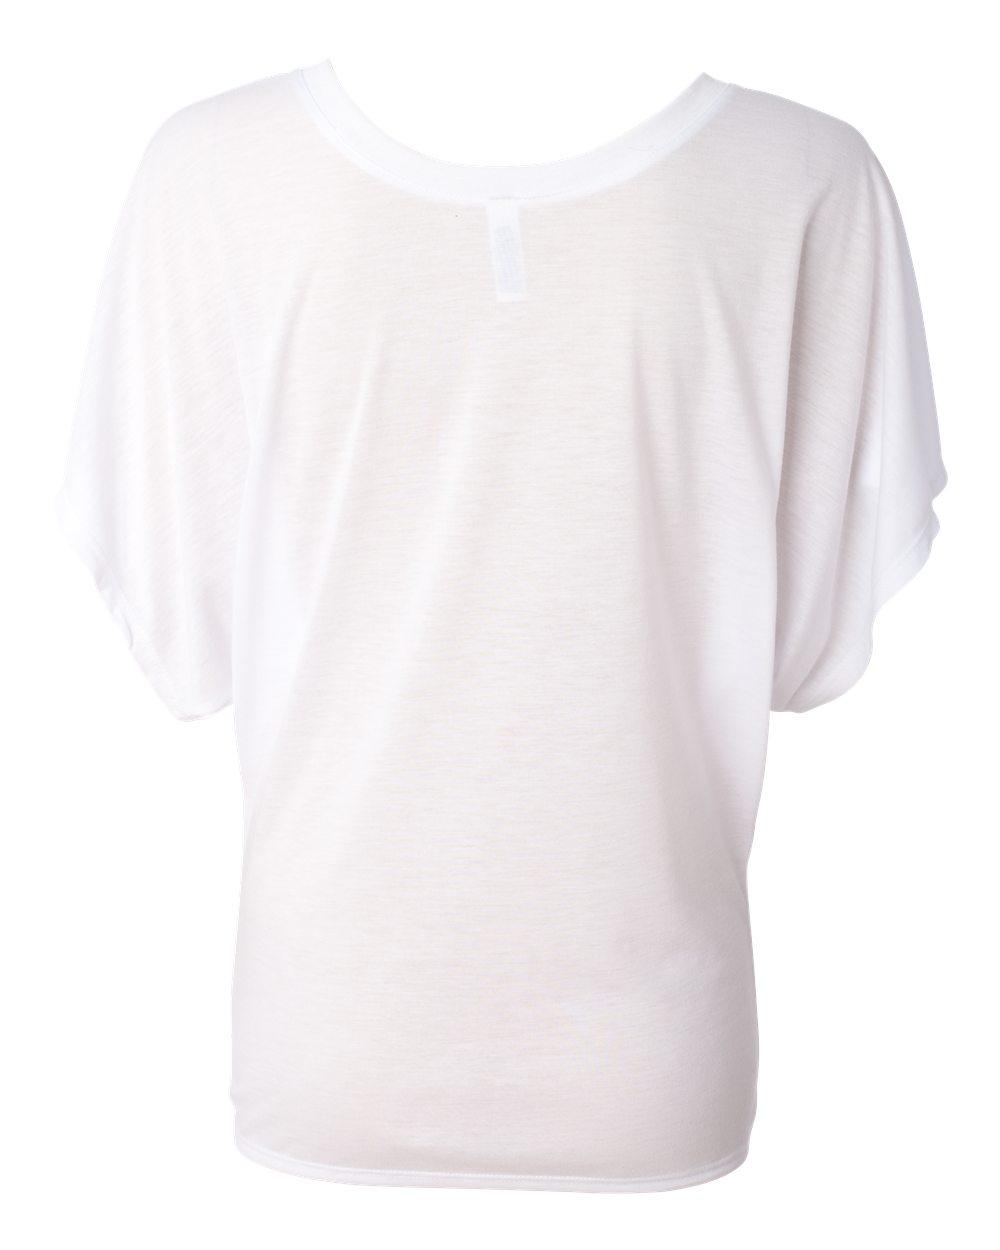 Bella-Canvas-Women-039-s-Flowy-Draped-Sleeve-Dolman-T-Shirt-8821-S-2XL thumbnail 31